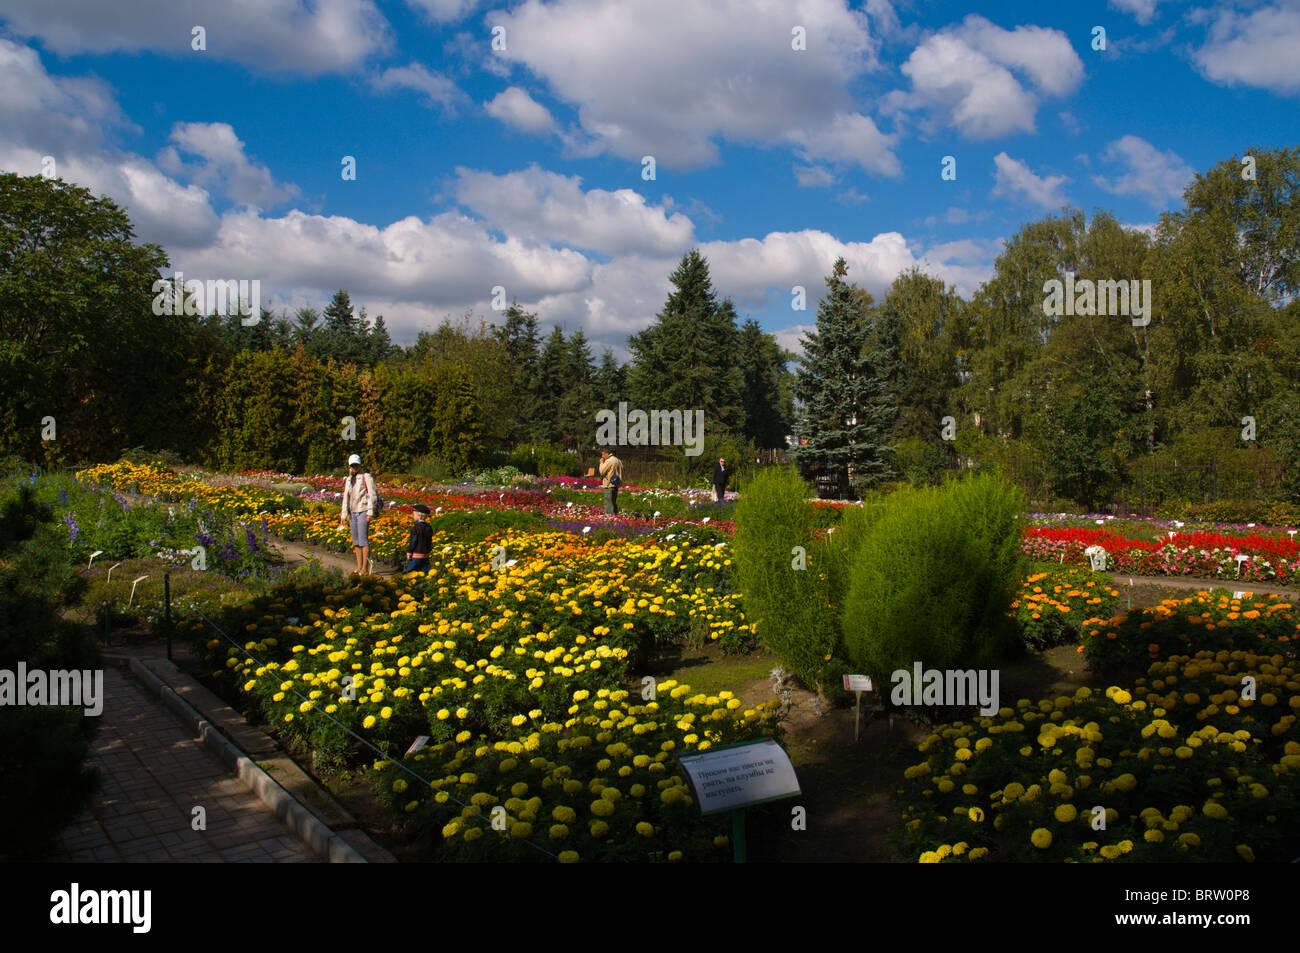 Botanical Garden (VDNH) in Moscow